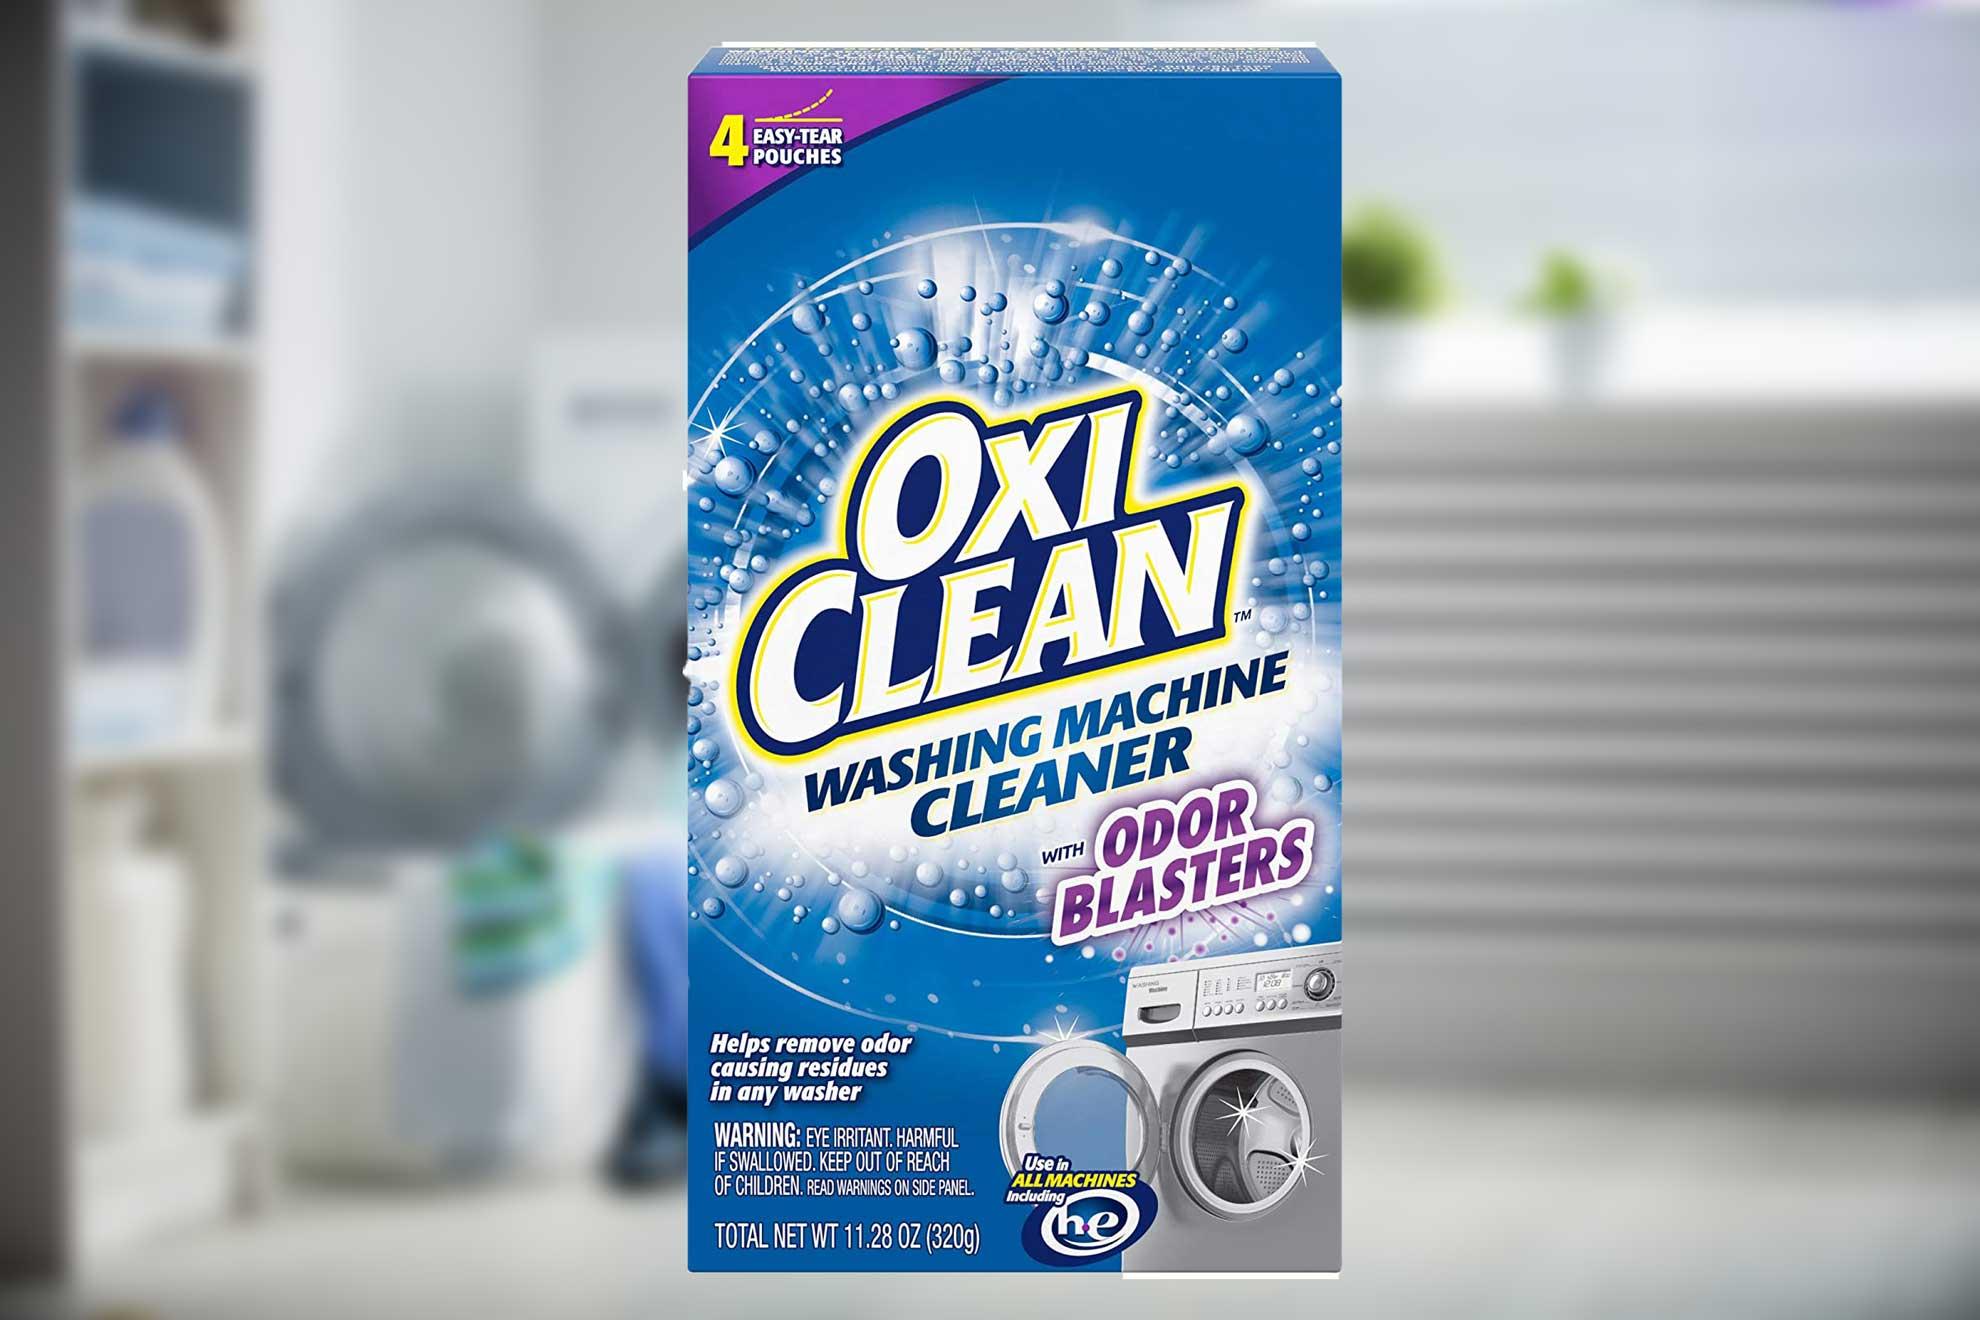 Oxiclean washing machine Cleaner